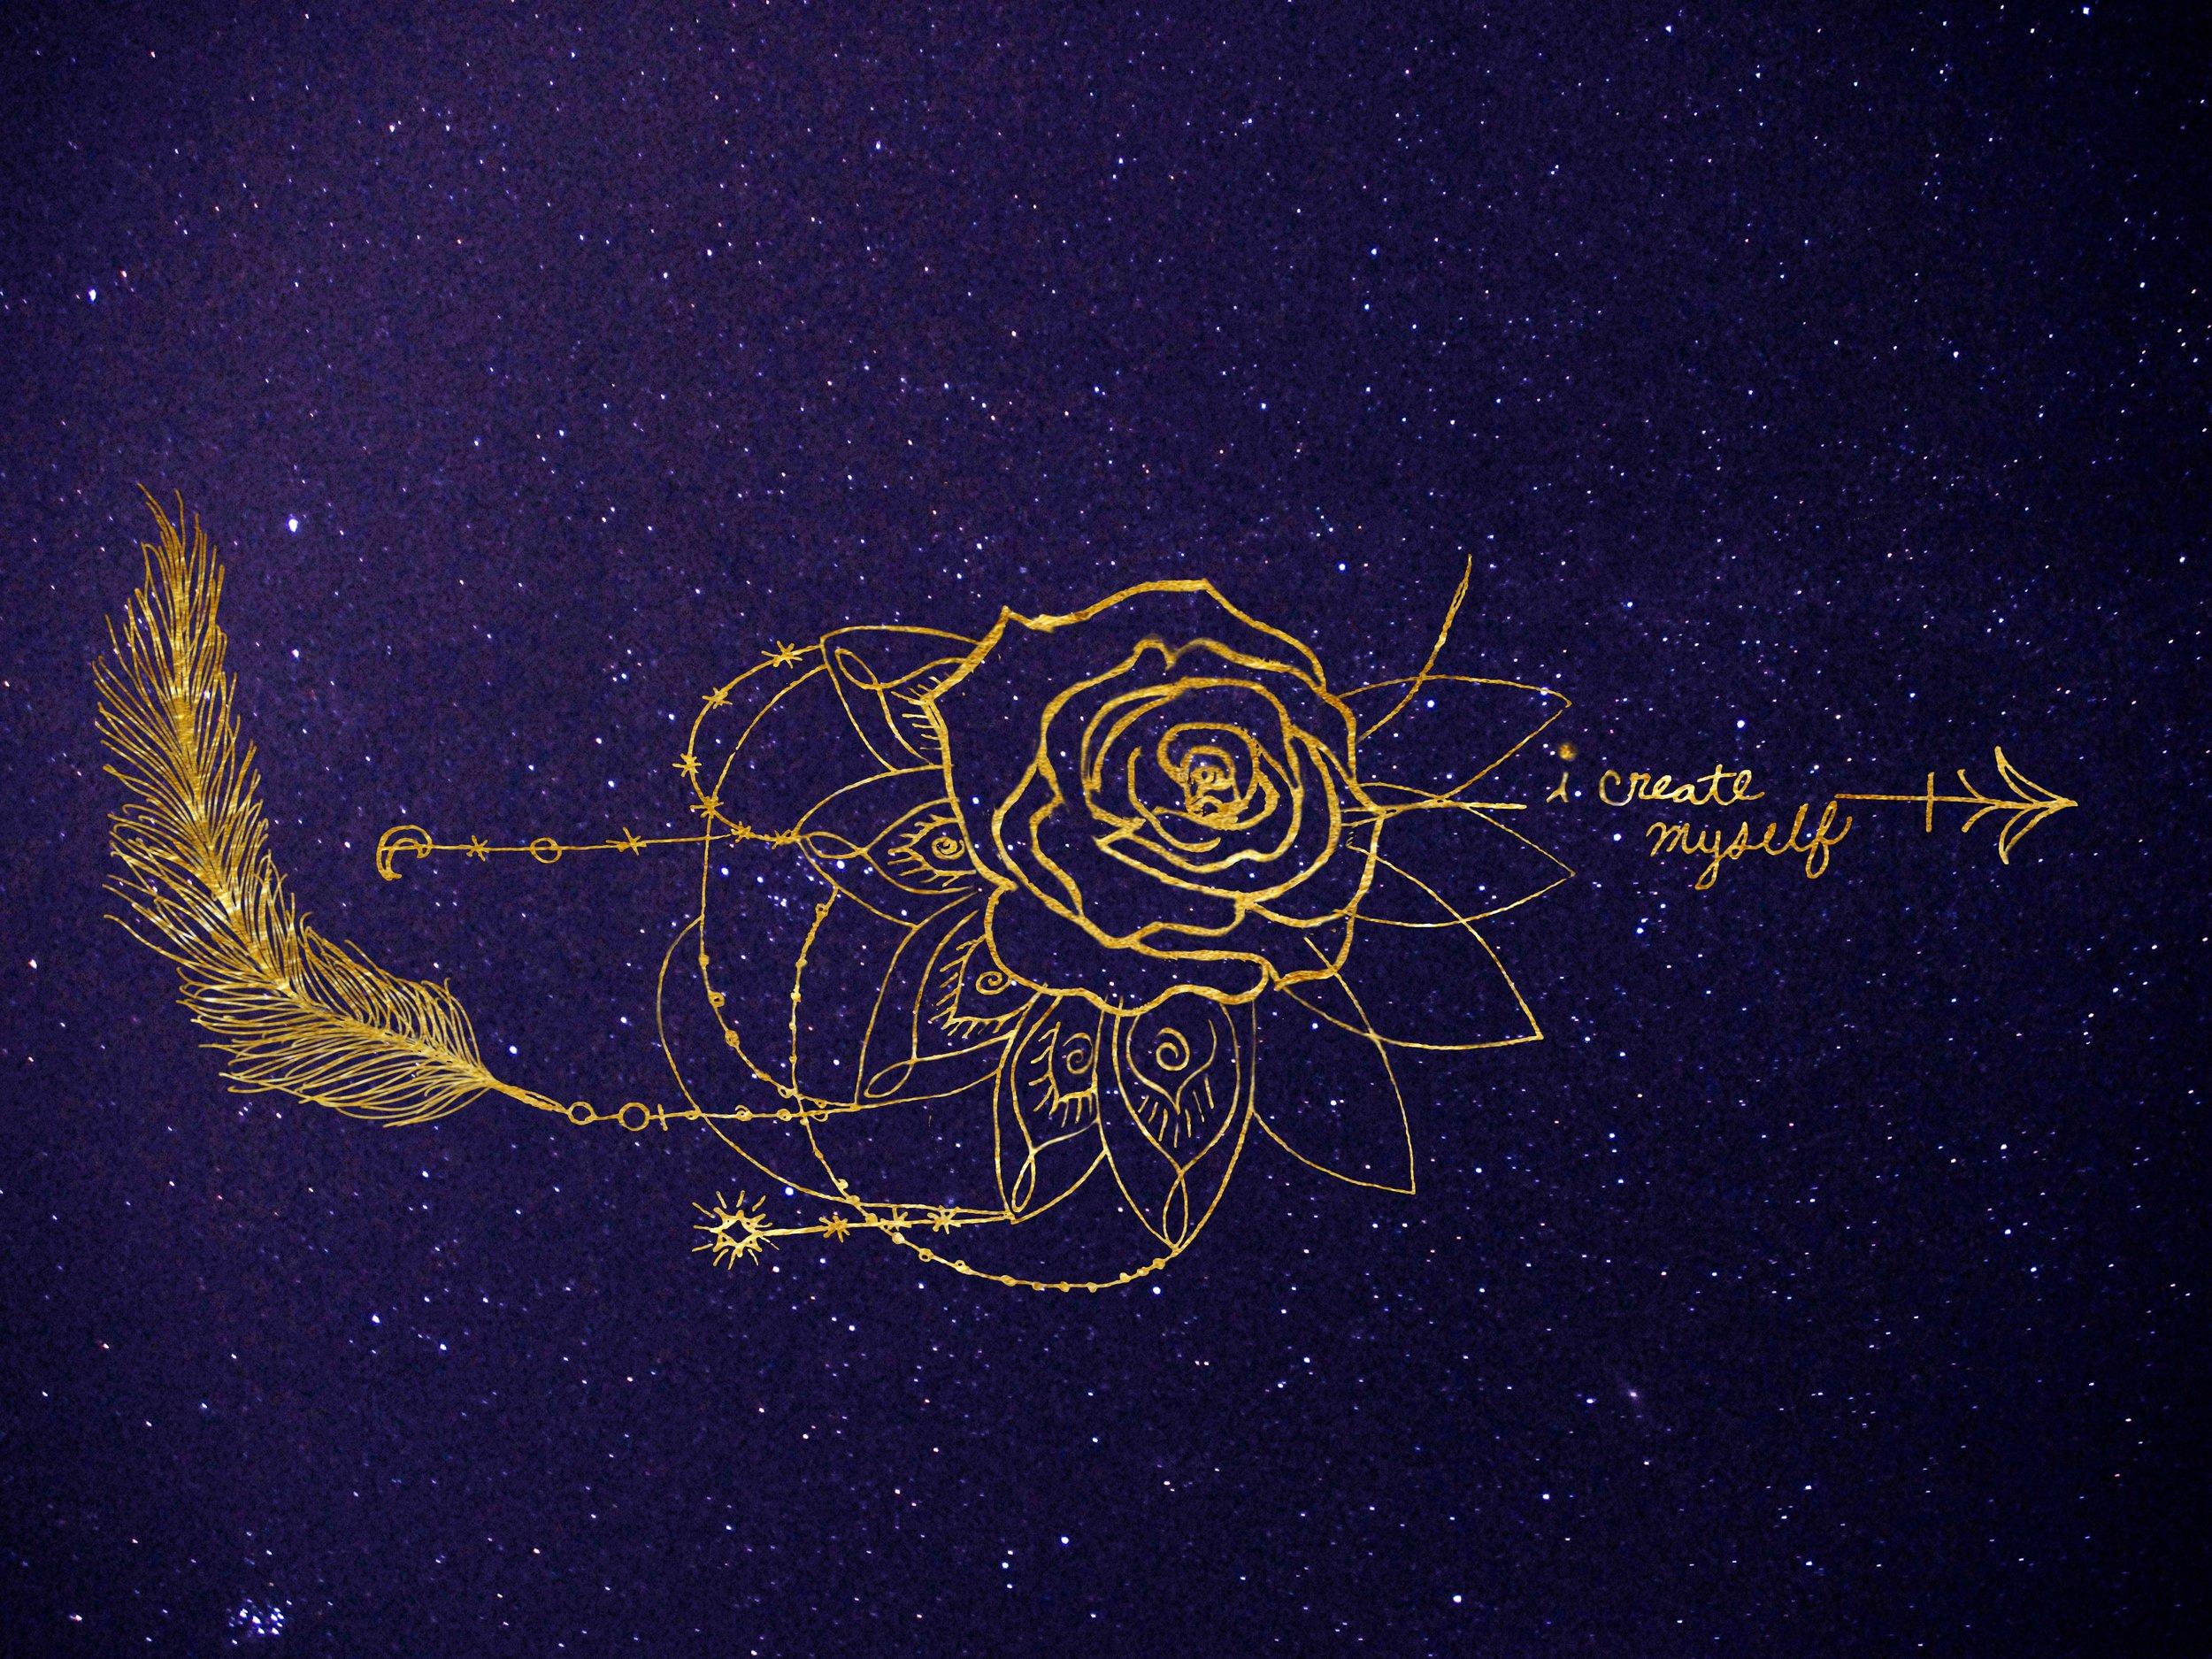 dreamcatcher rose design-galaxy copy.jpg